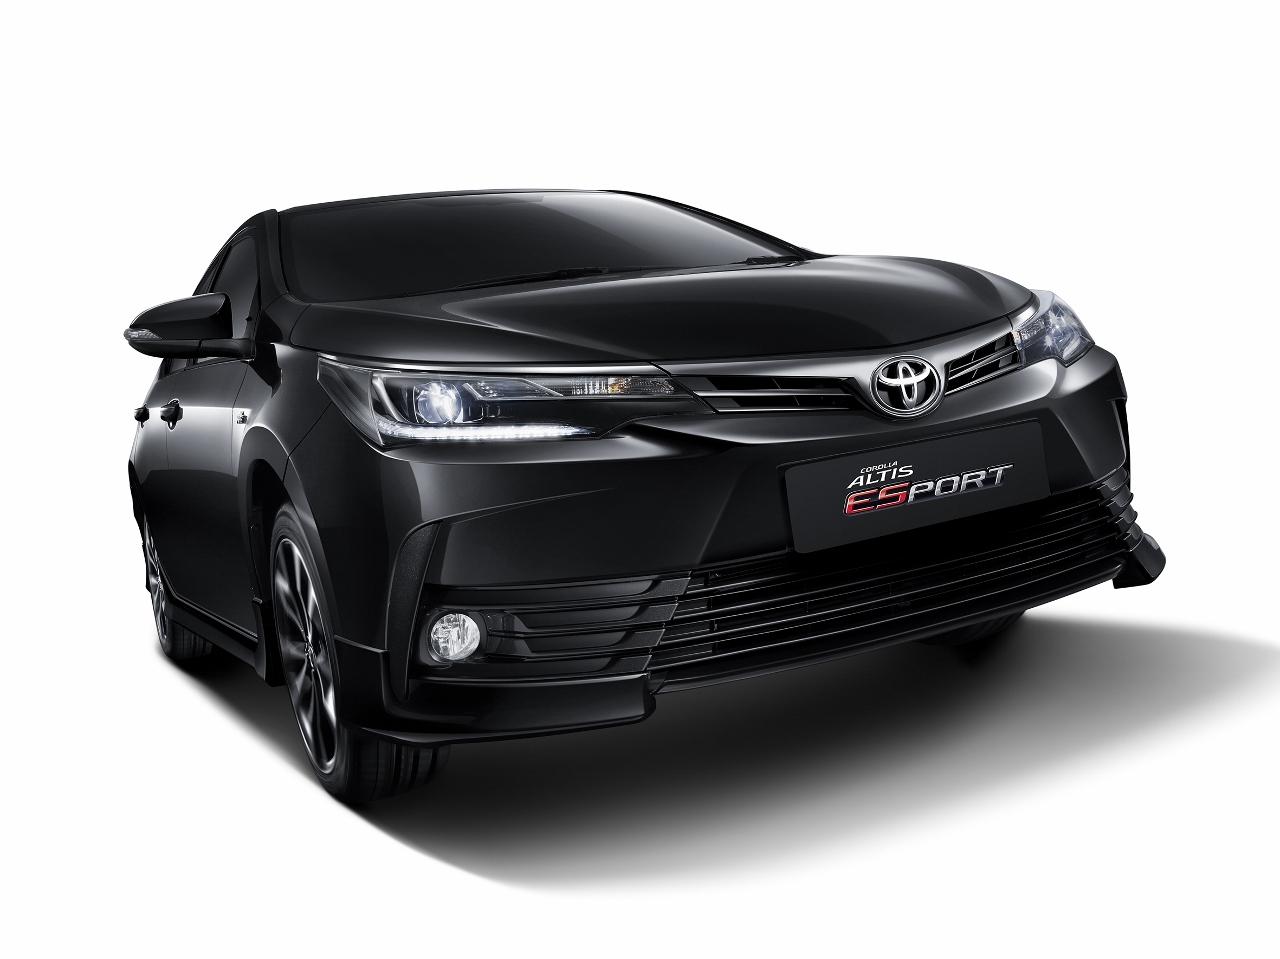 2017 Toyota Corolla Esport front quarter Thailand